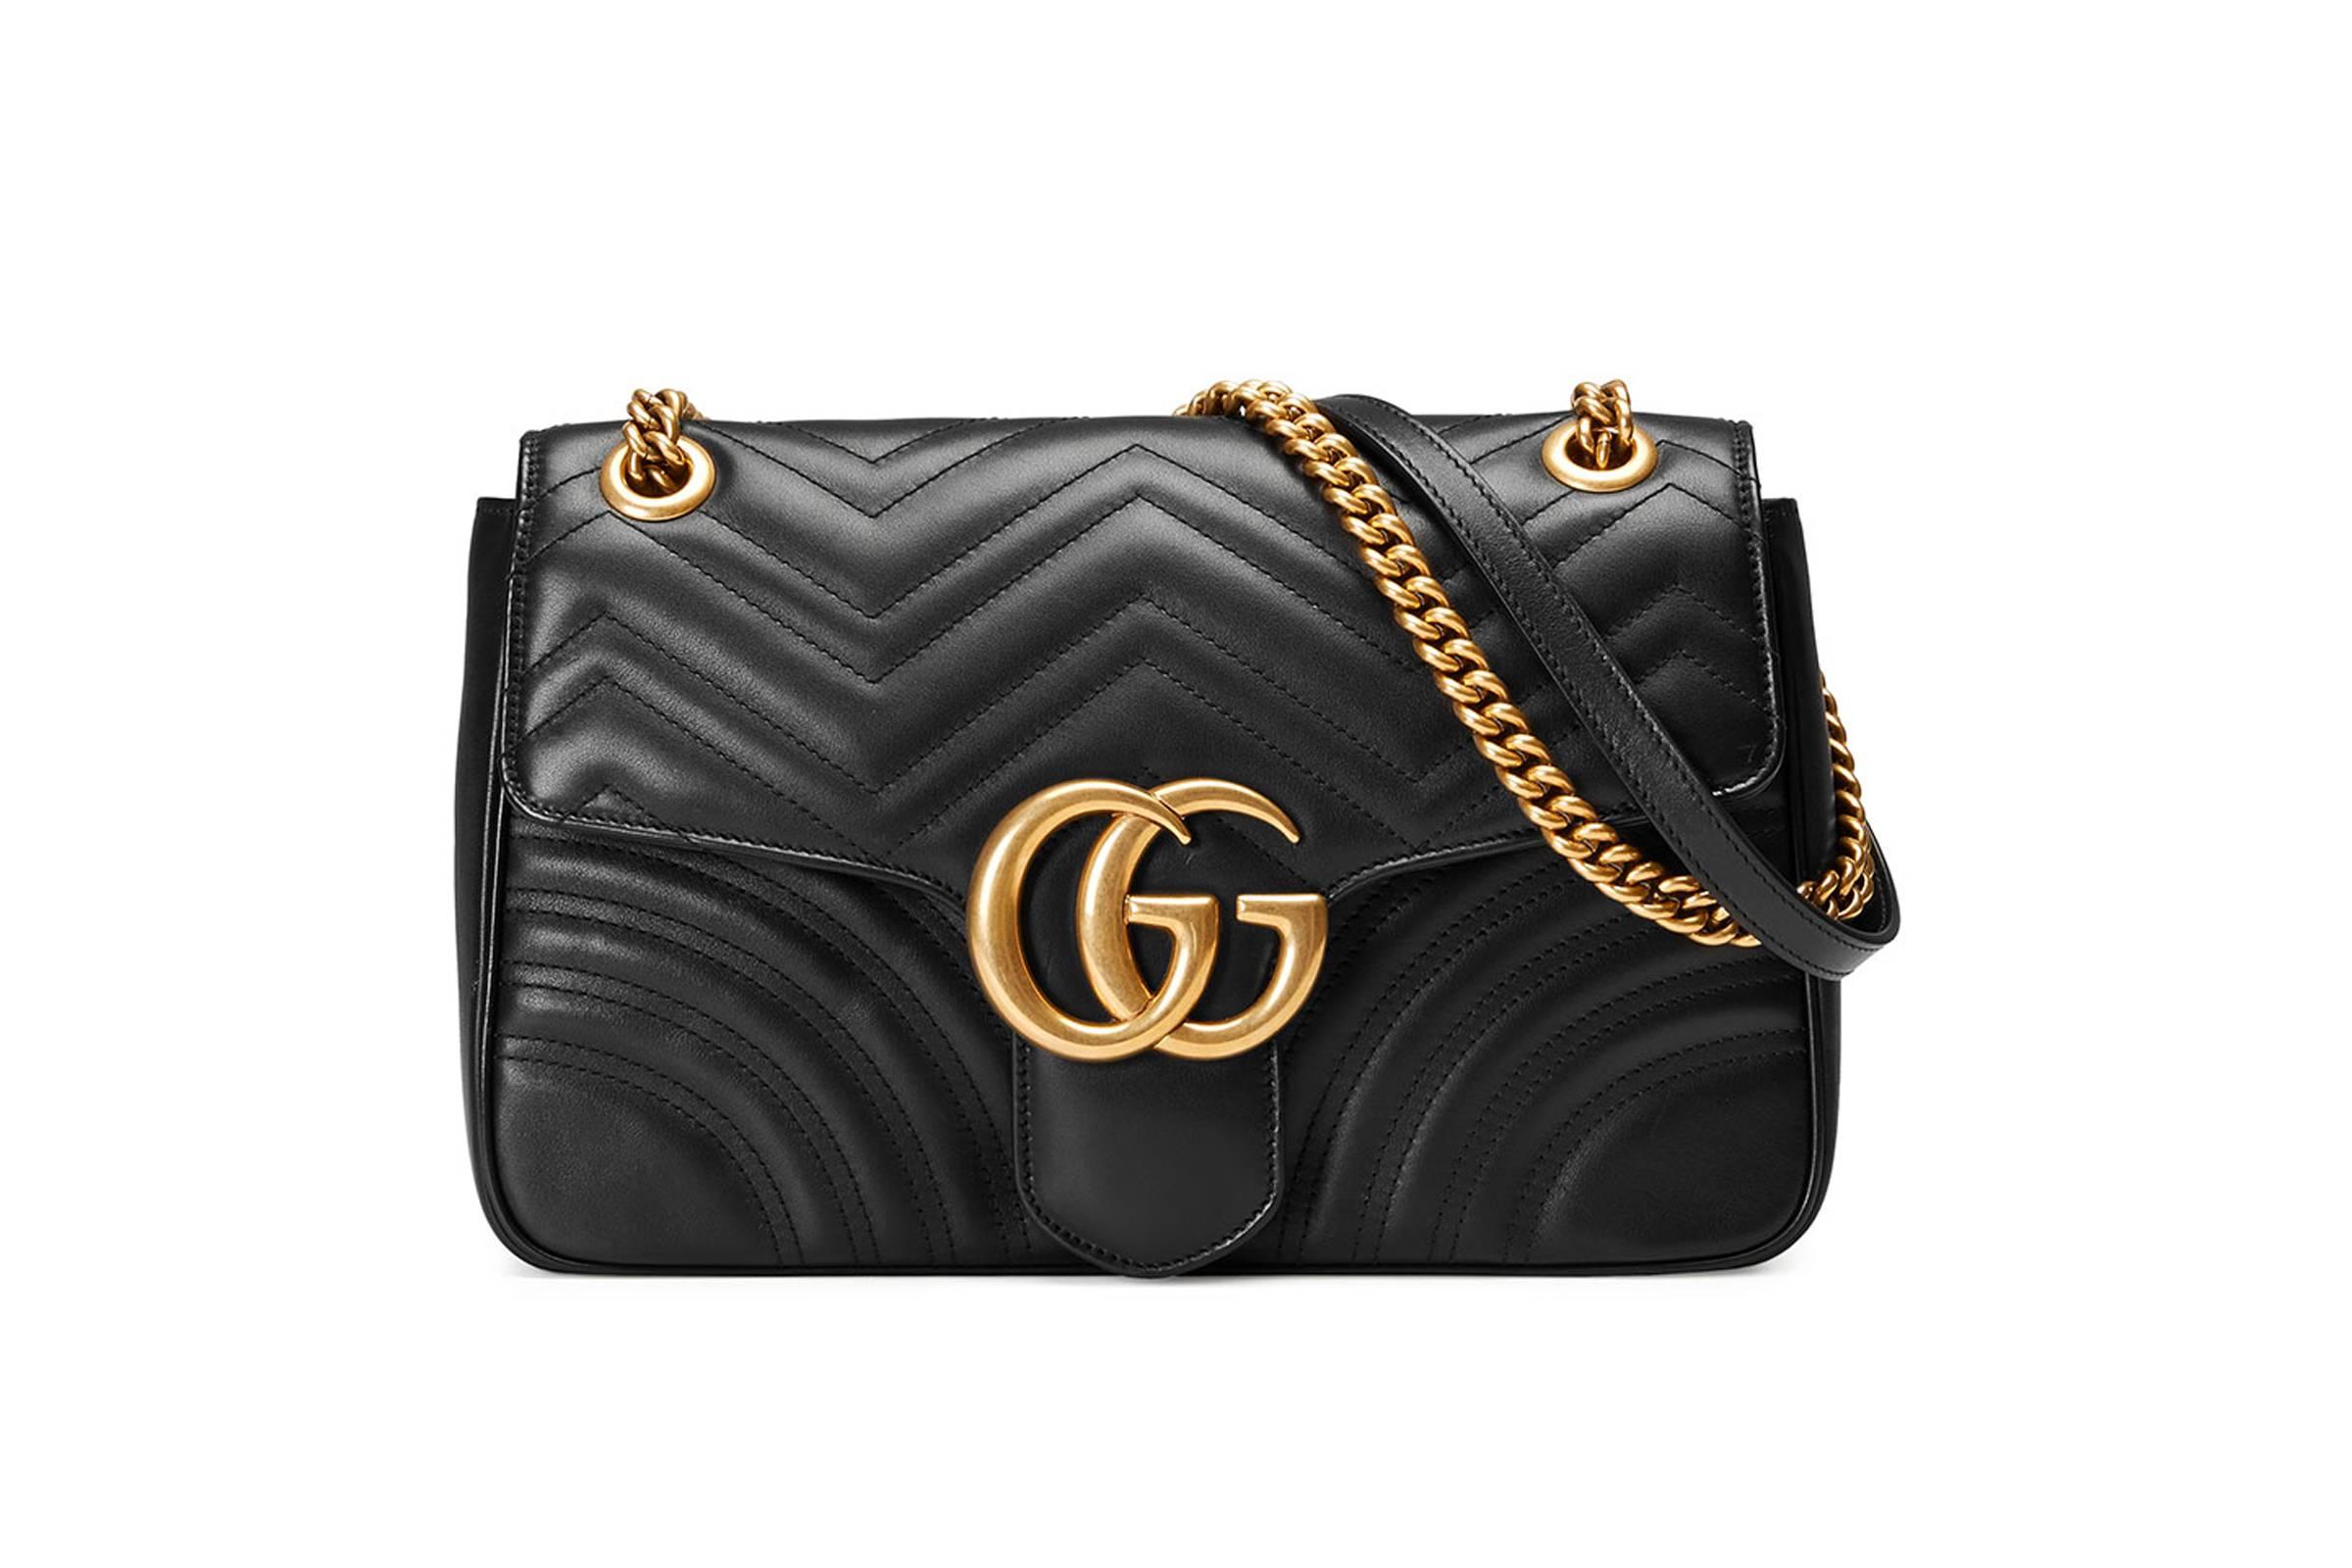 Gucci Marmont Matelasse Handbag